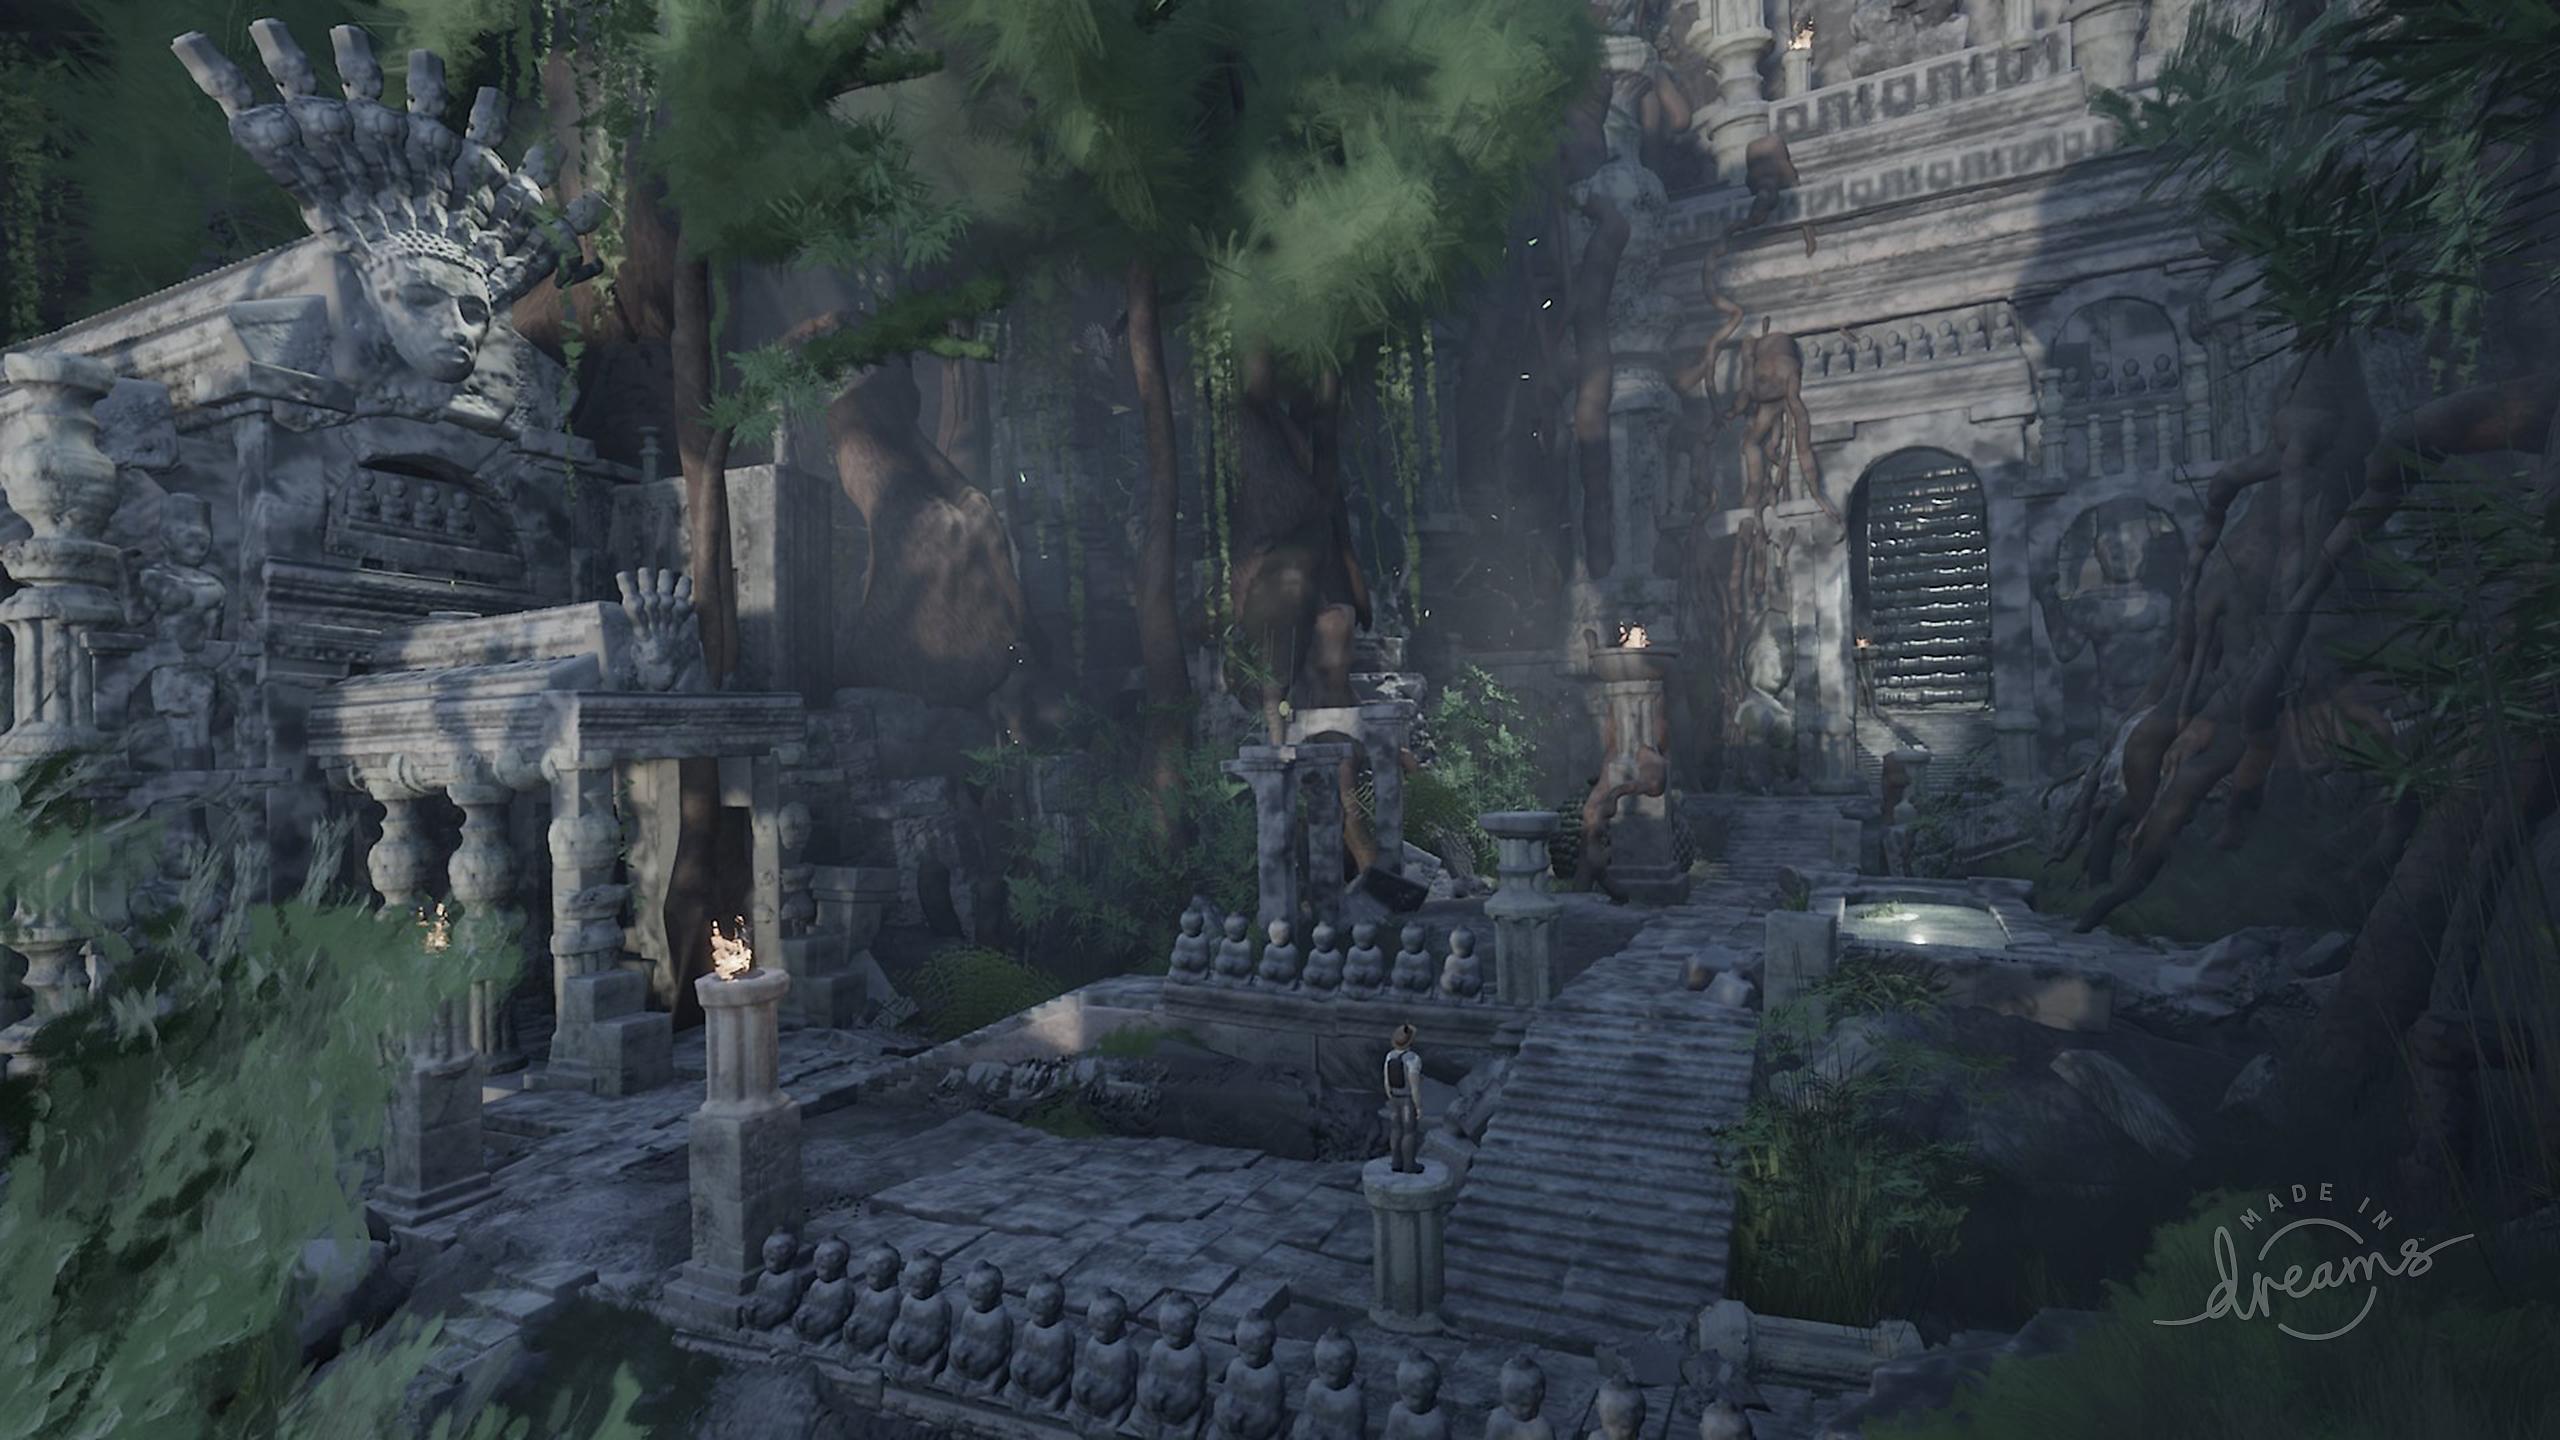 Dreams screenshot 13